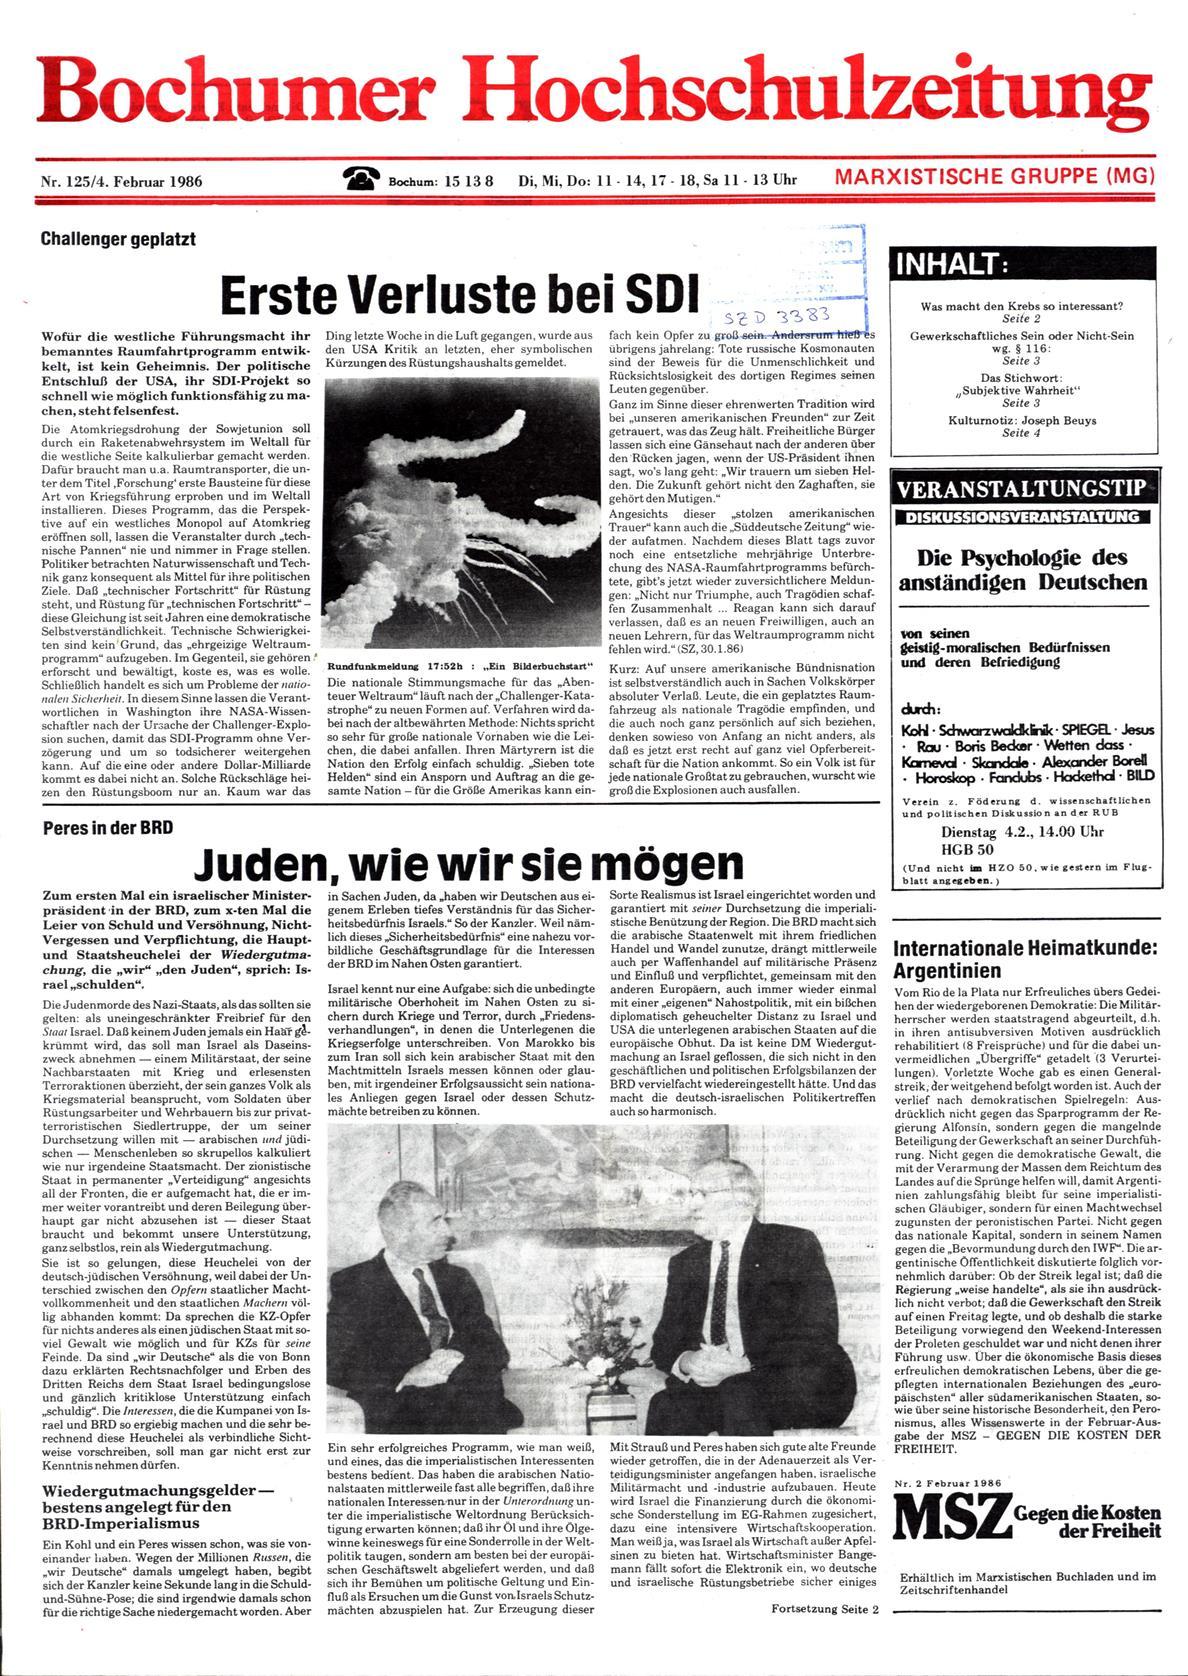 Bochum_BHZ_19860204_125_001